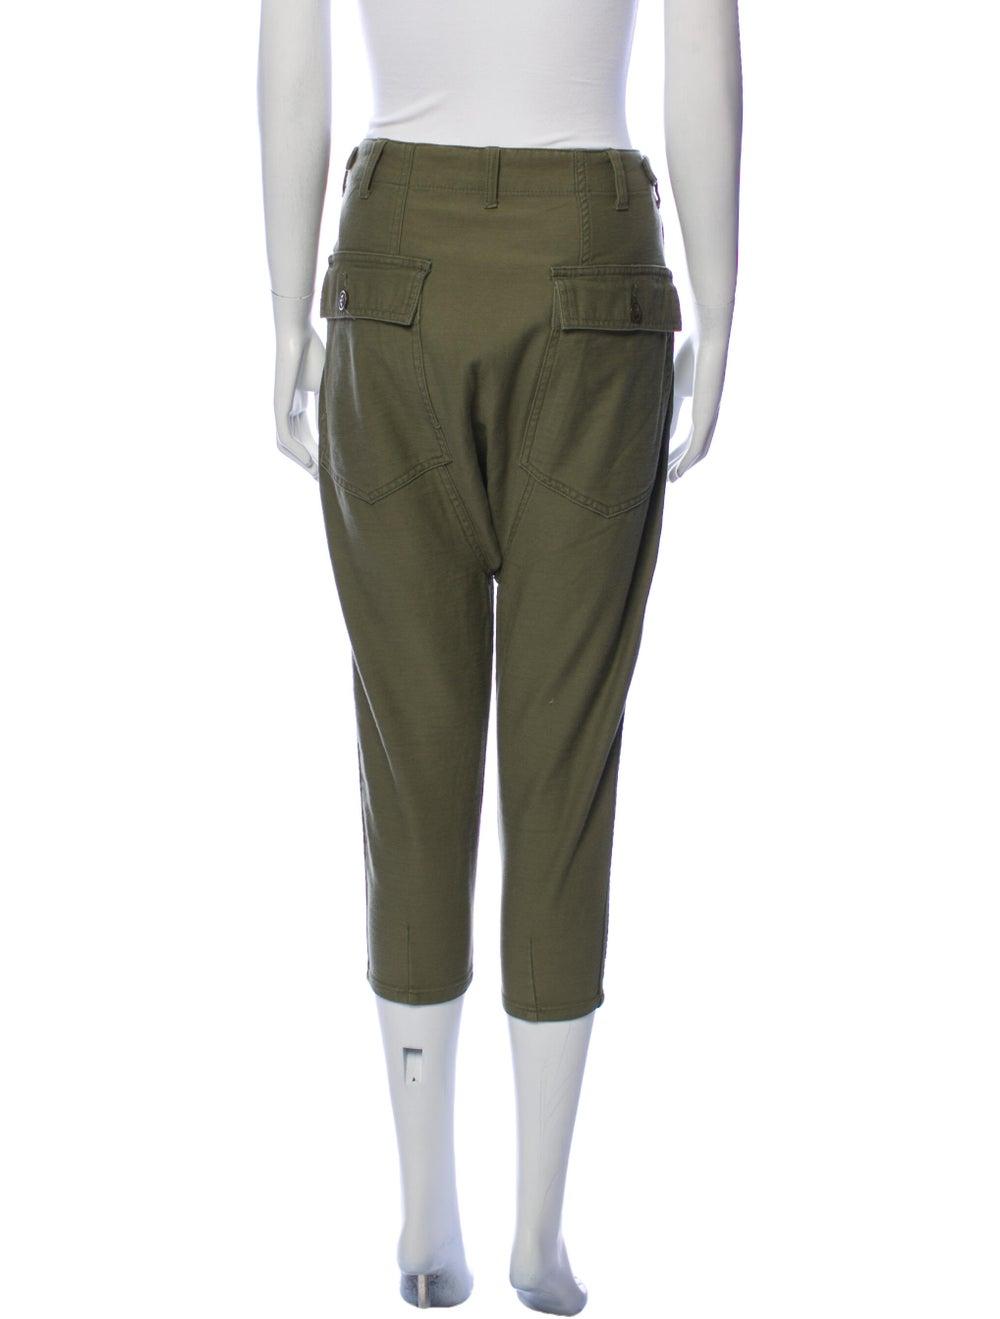 Nlst Straight Leg Pants Green - image 3